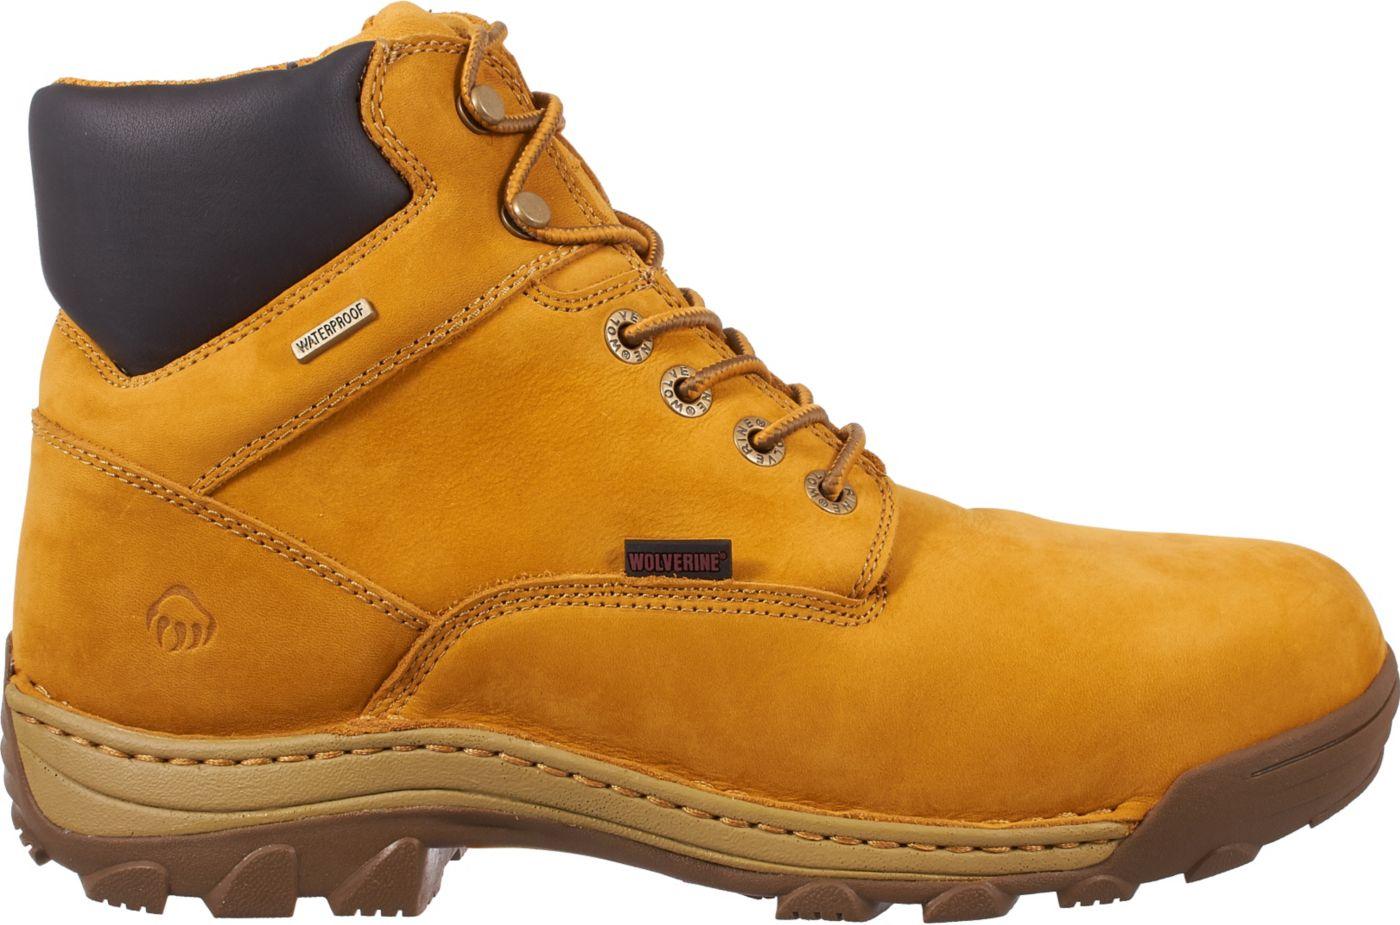 Wolverine Men's Dublin Waterproof 200g Work Boots